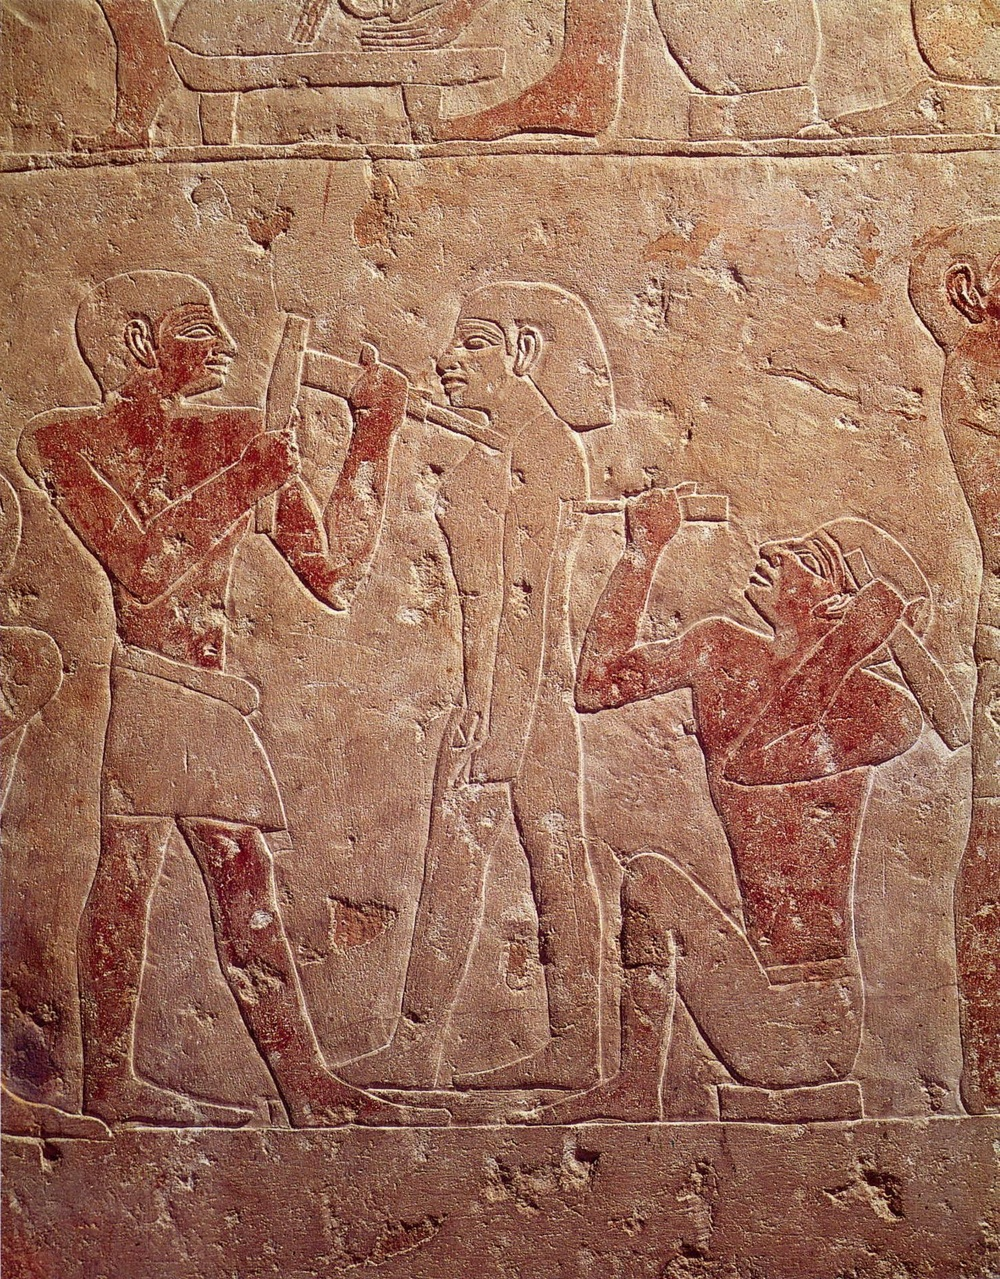 Two-Sculptors-Working-on-a-Statue-2510-2460-BC-Saqqara-Egyptian-Museum-Cairo 3B - Mastaba of  Kaemrehu.jpg